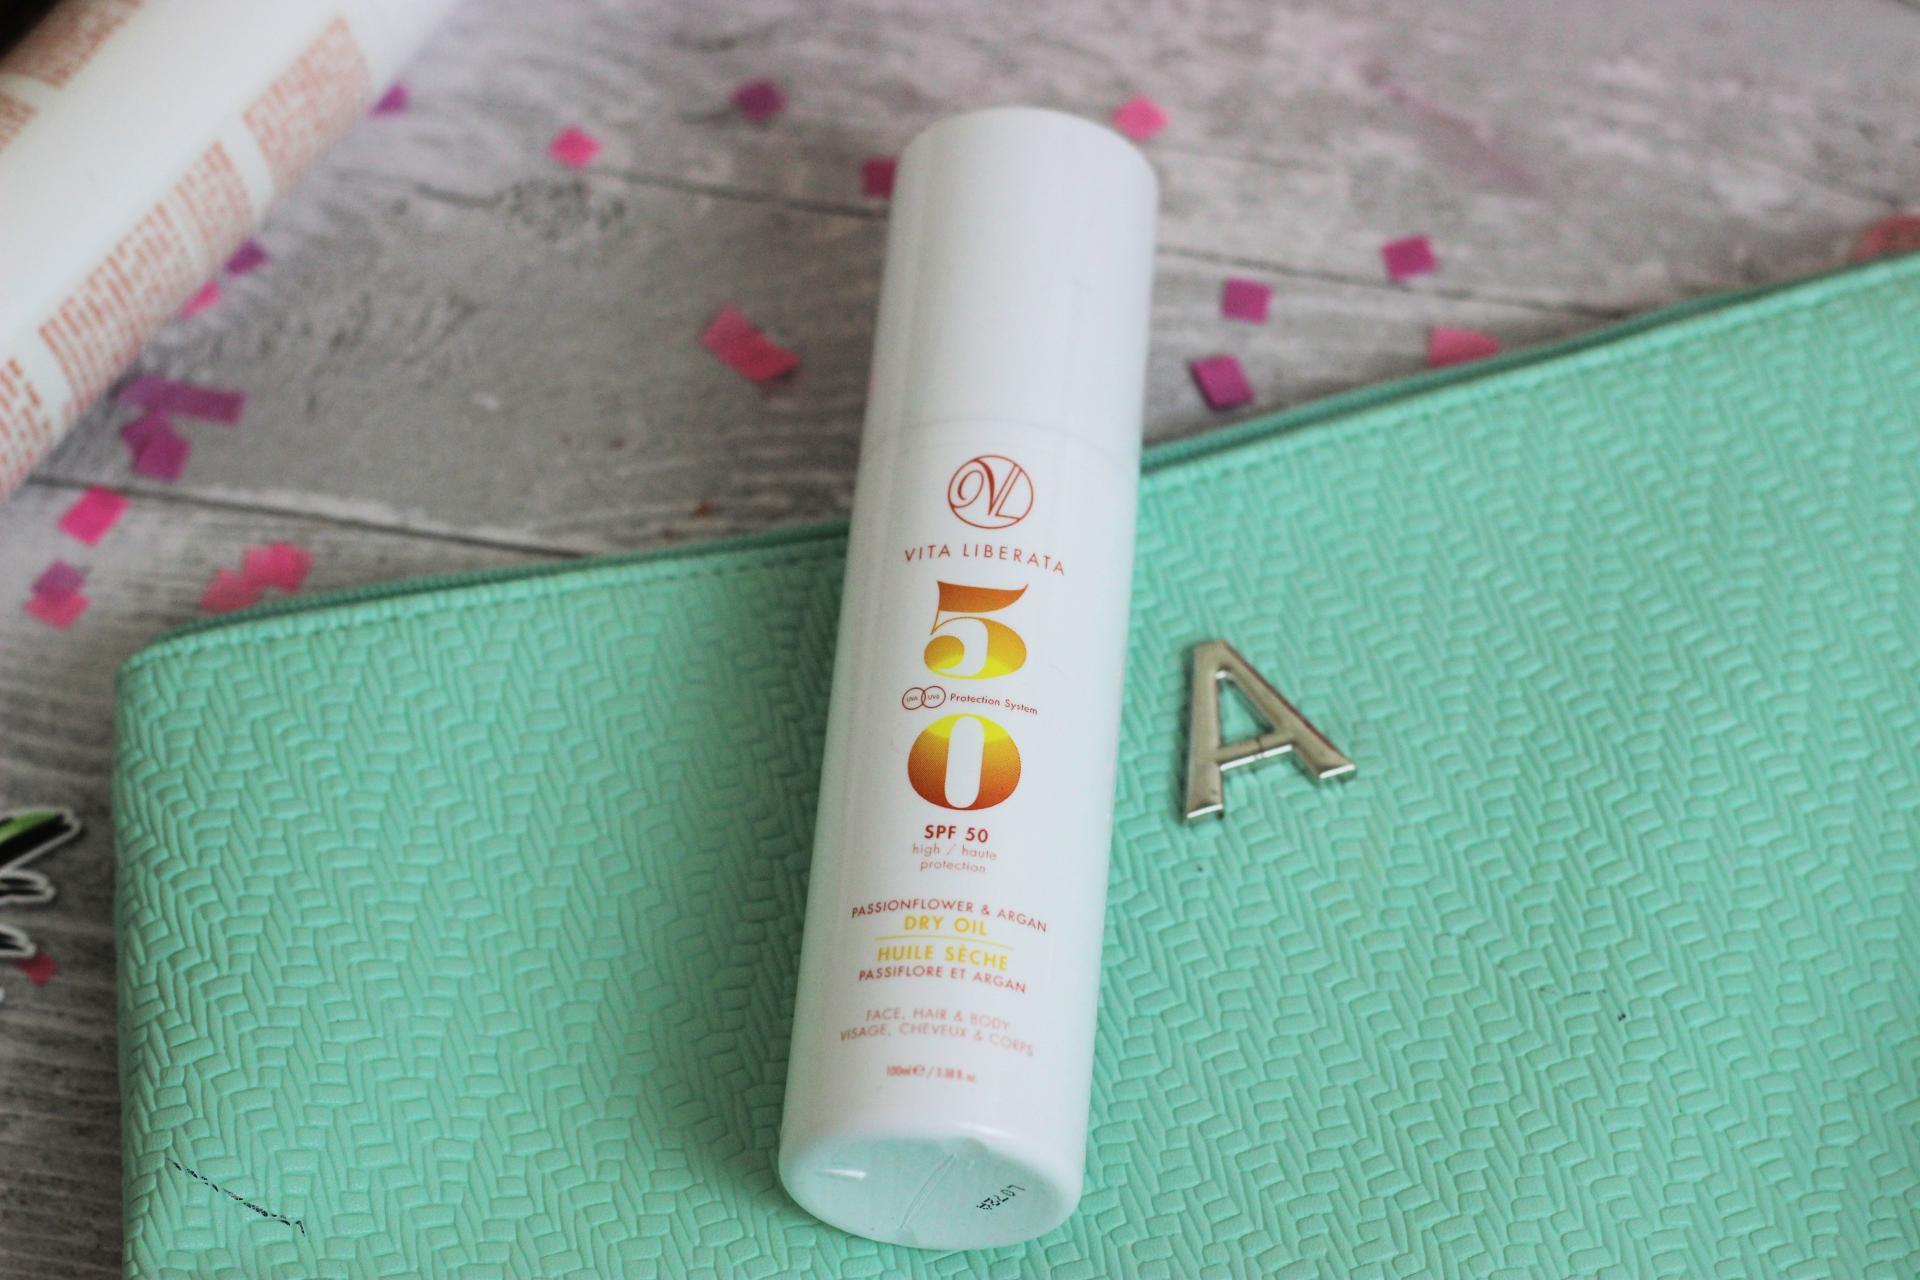 Sun Protection - Staying Safe with SPF  Vita Liberata